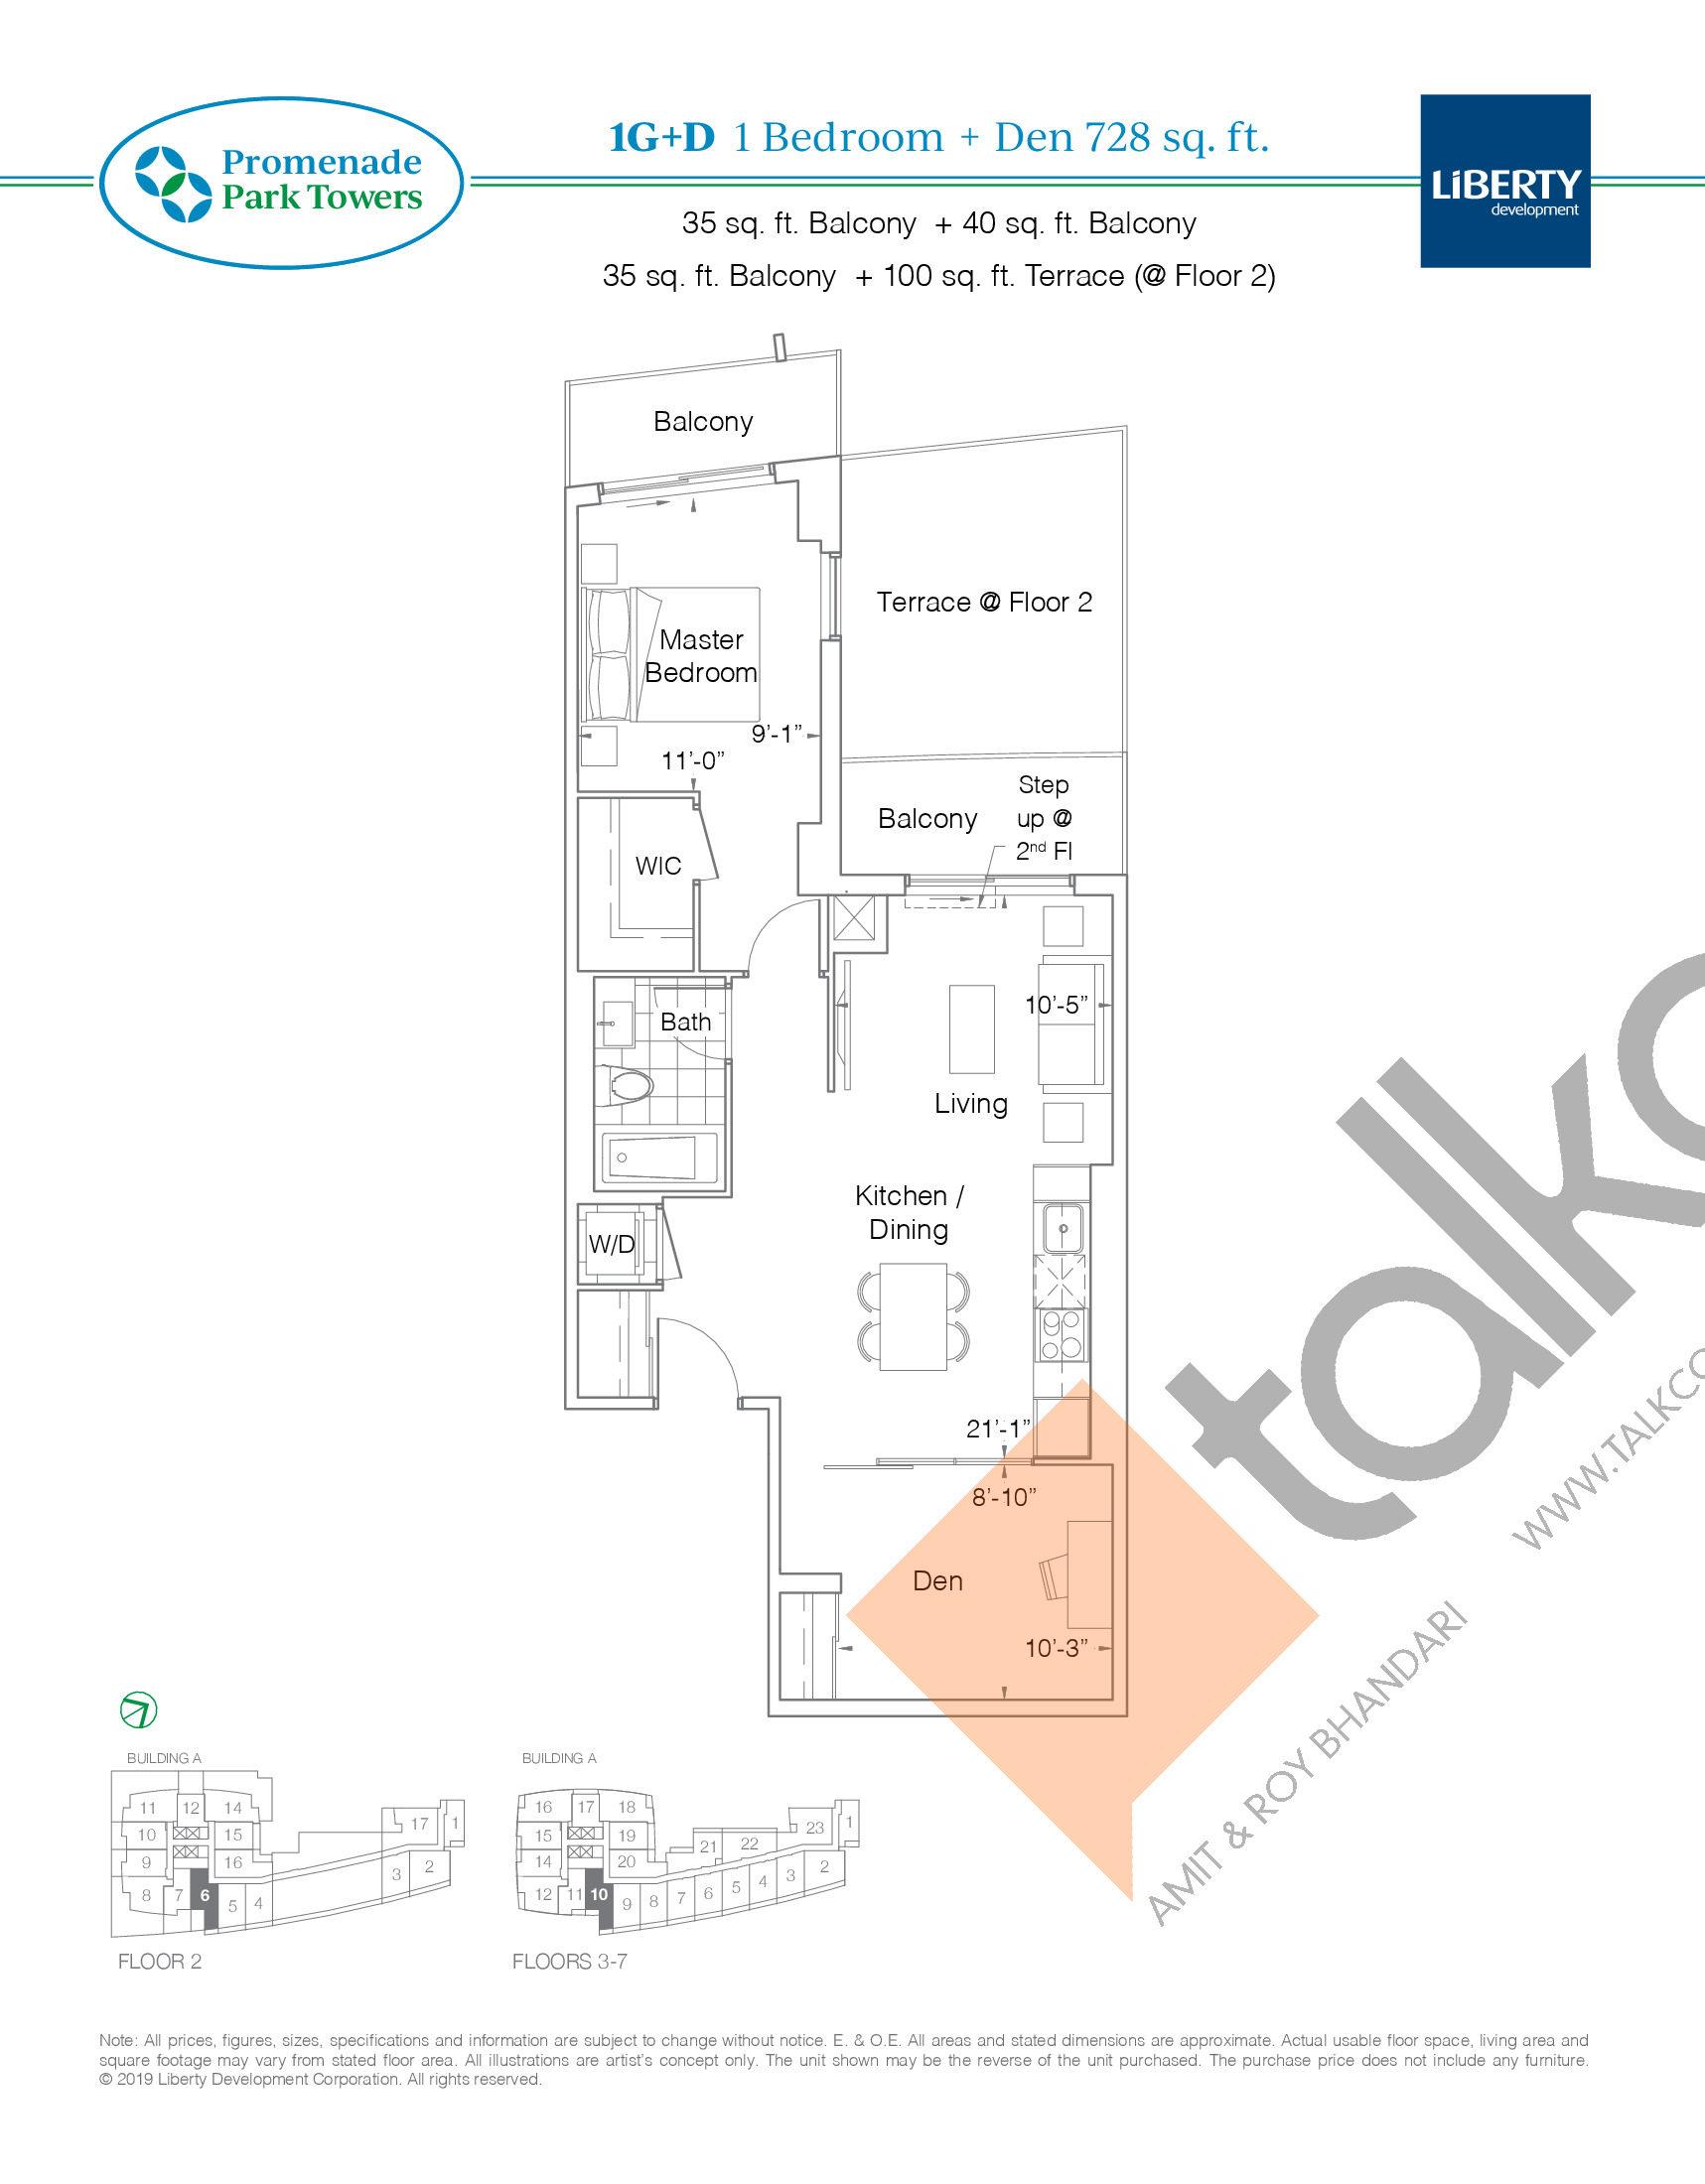 1G+D Floor Plan at Promenade Park Towers Condos - 728 sq.ft